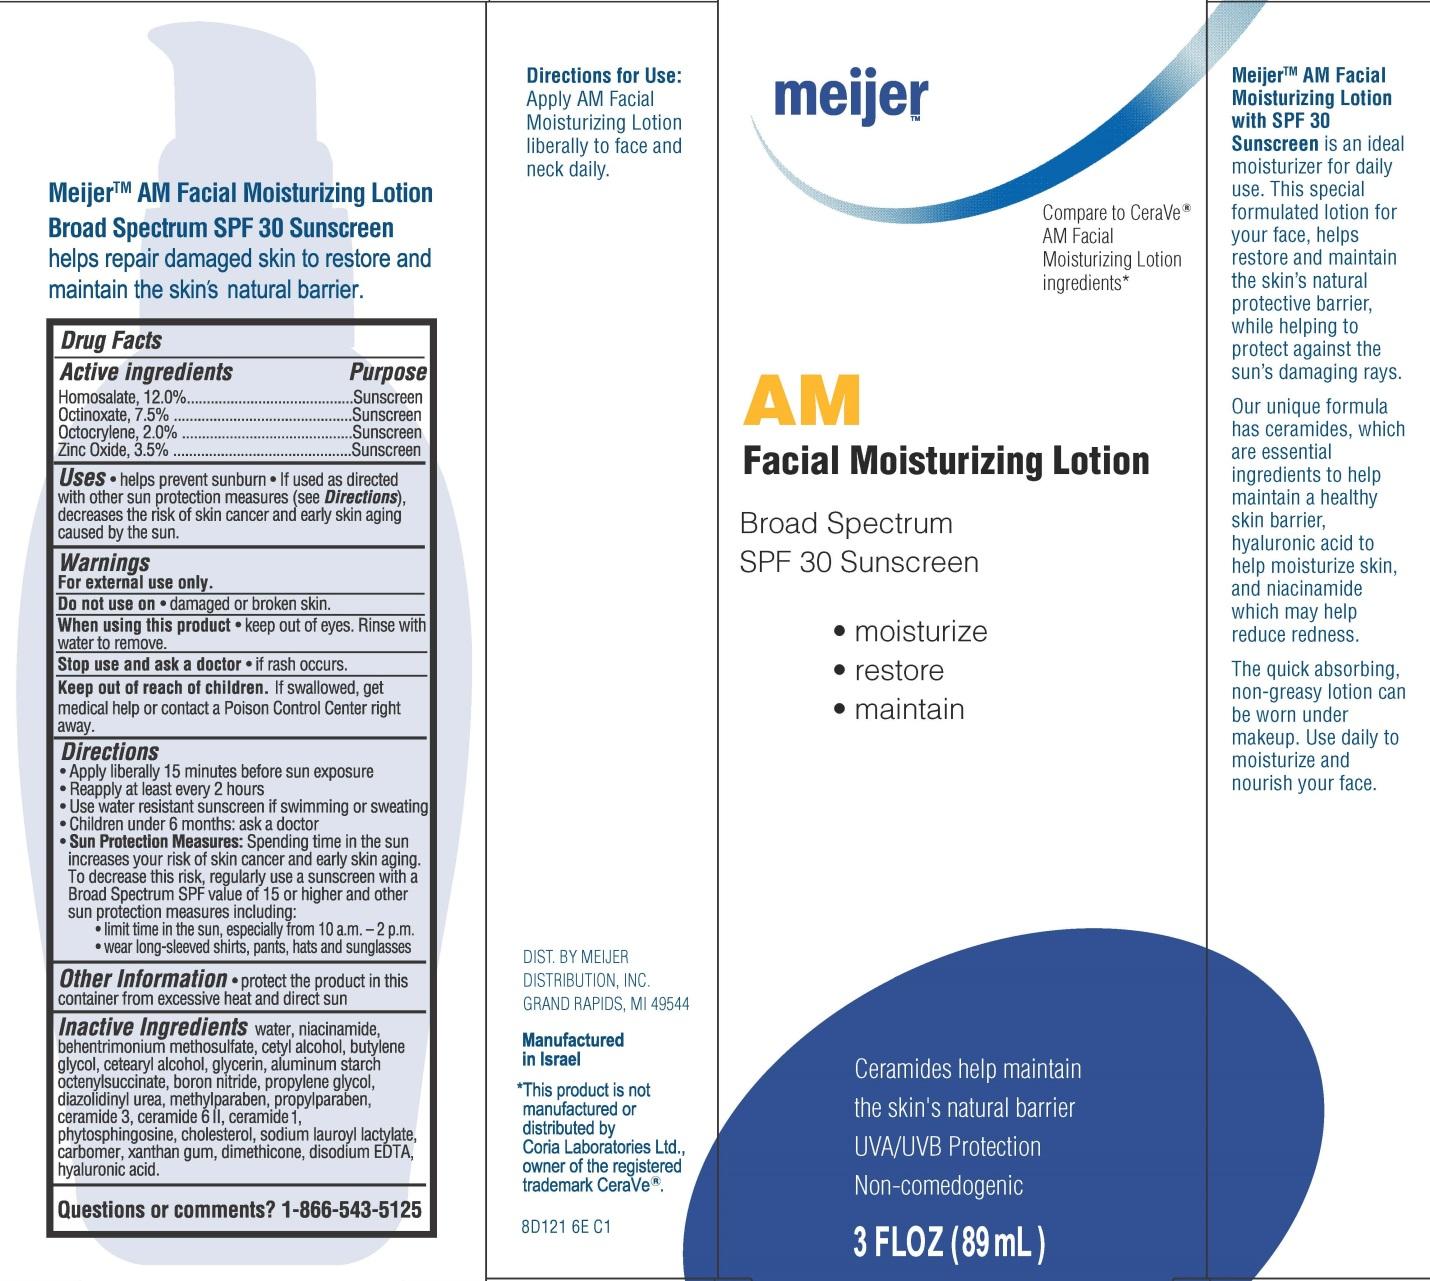 Meijer Am Facial Moisturizing Broad Spectrum Spf 30 Sunscreen (Homosalate, Octinoxate, Octocrylene, And Zinc Oxide) Lotion [Meijer Distribution Inc]